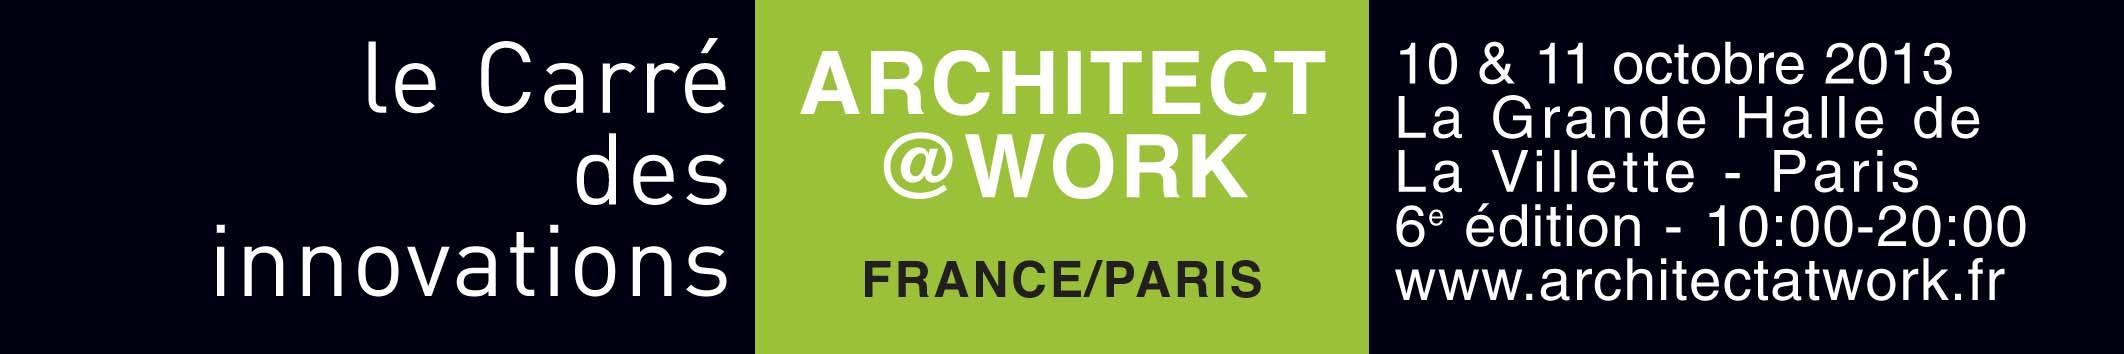 logo architect@work paris